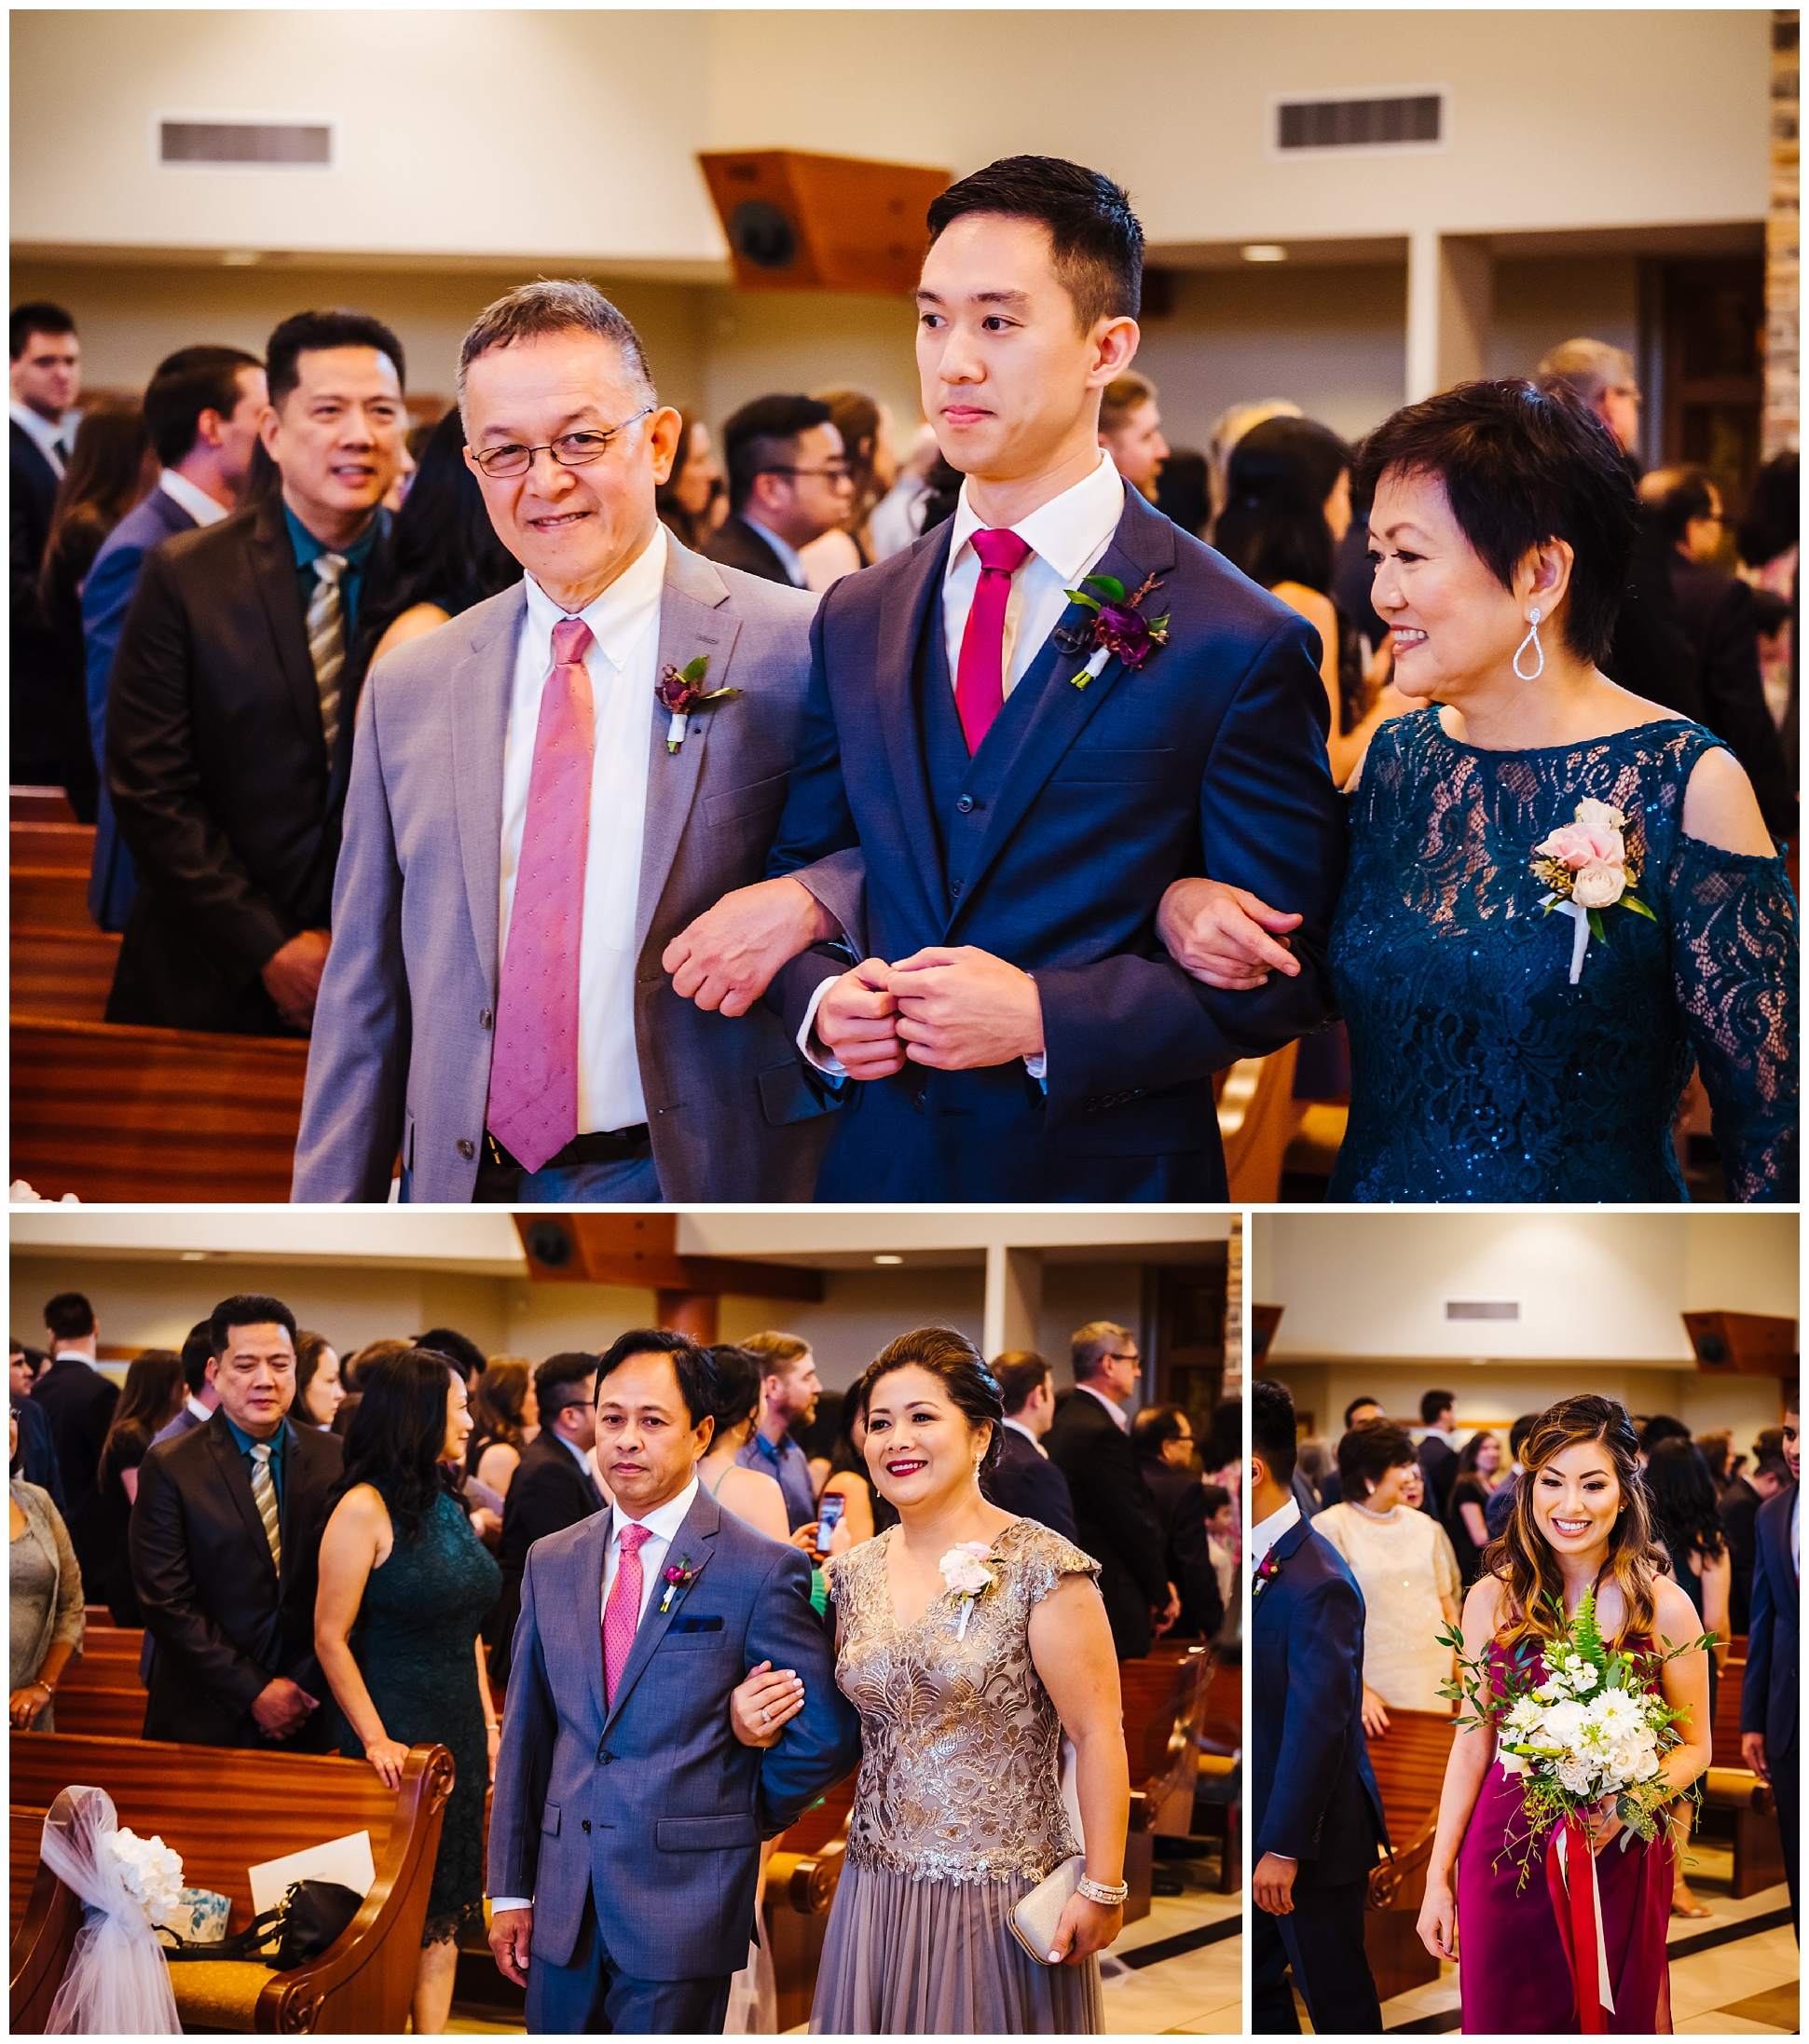 tampa-wedding-photographer-philipino-colorful-woods-ballroom-church-mass-confetti-fuscia_0027.jpg